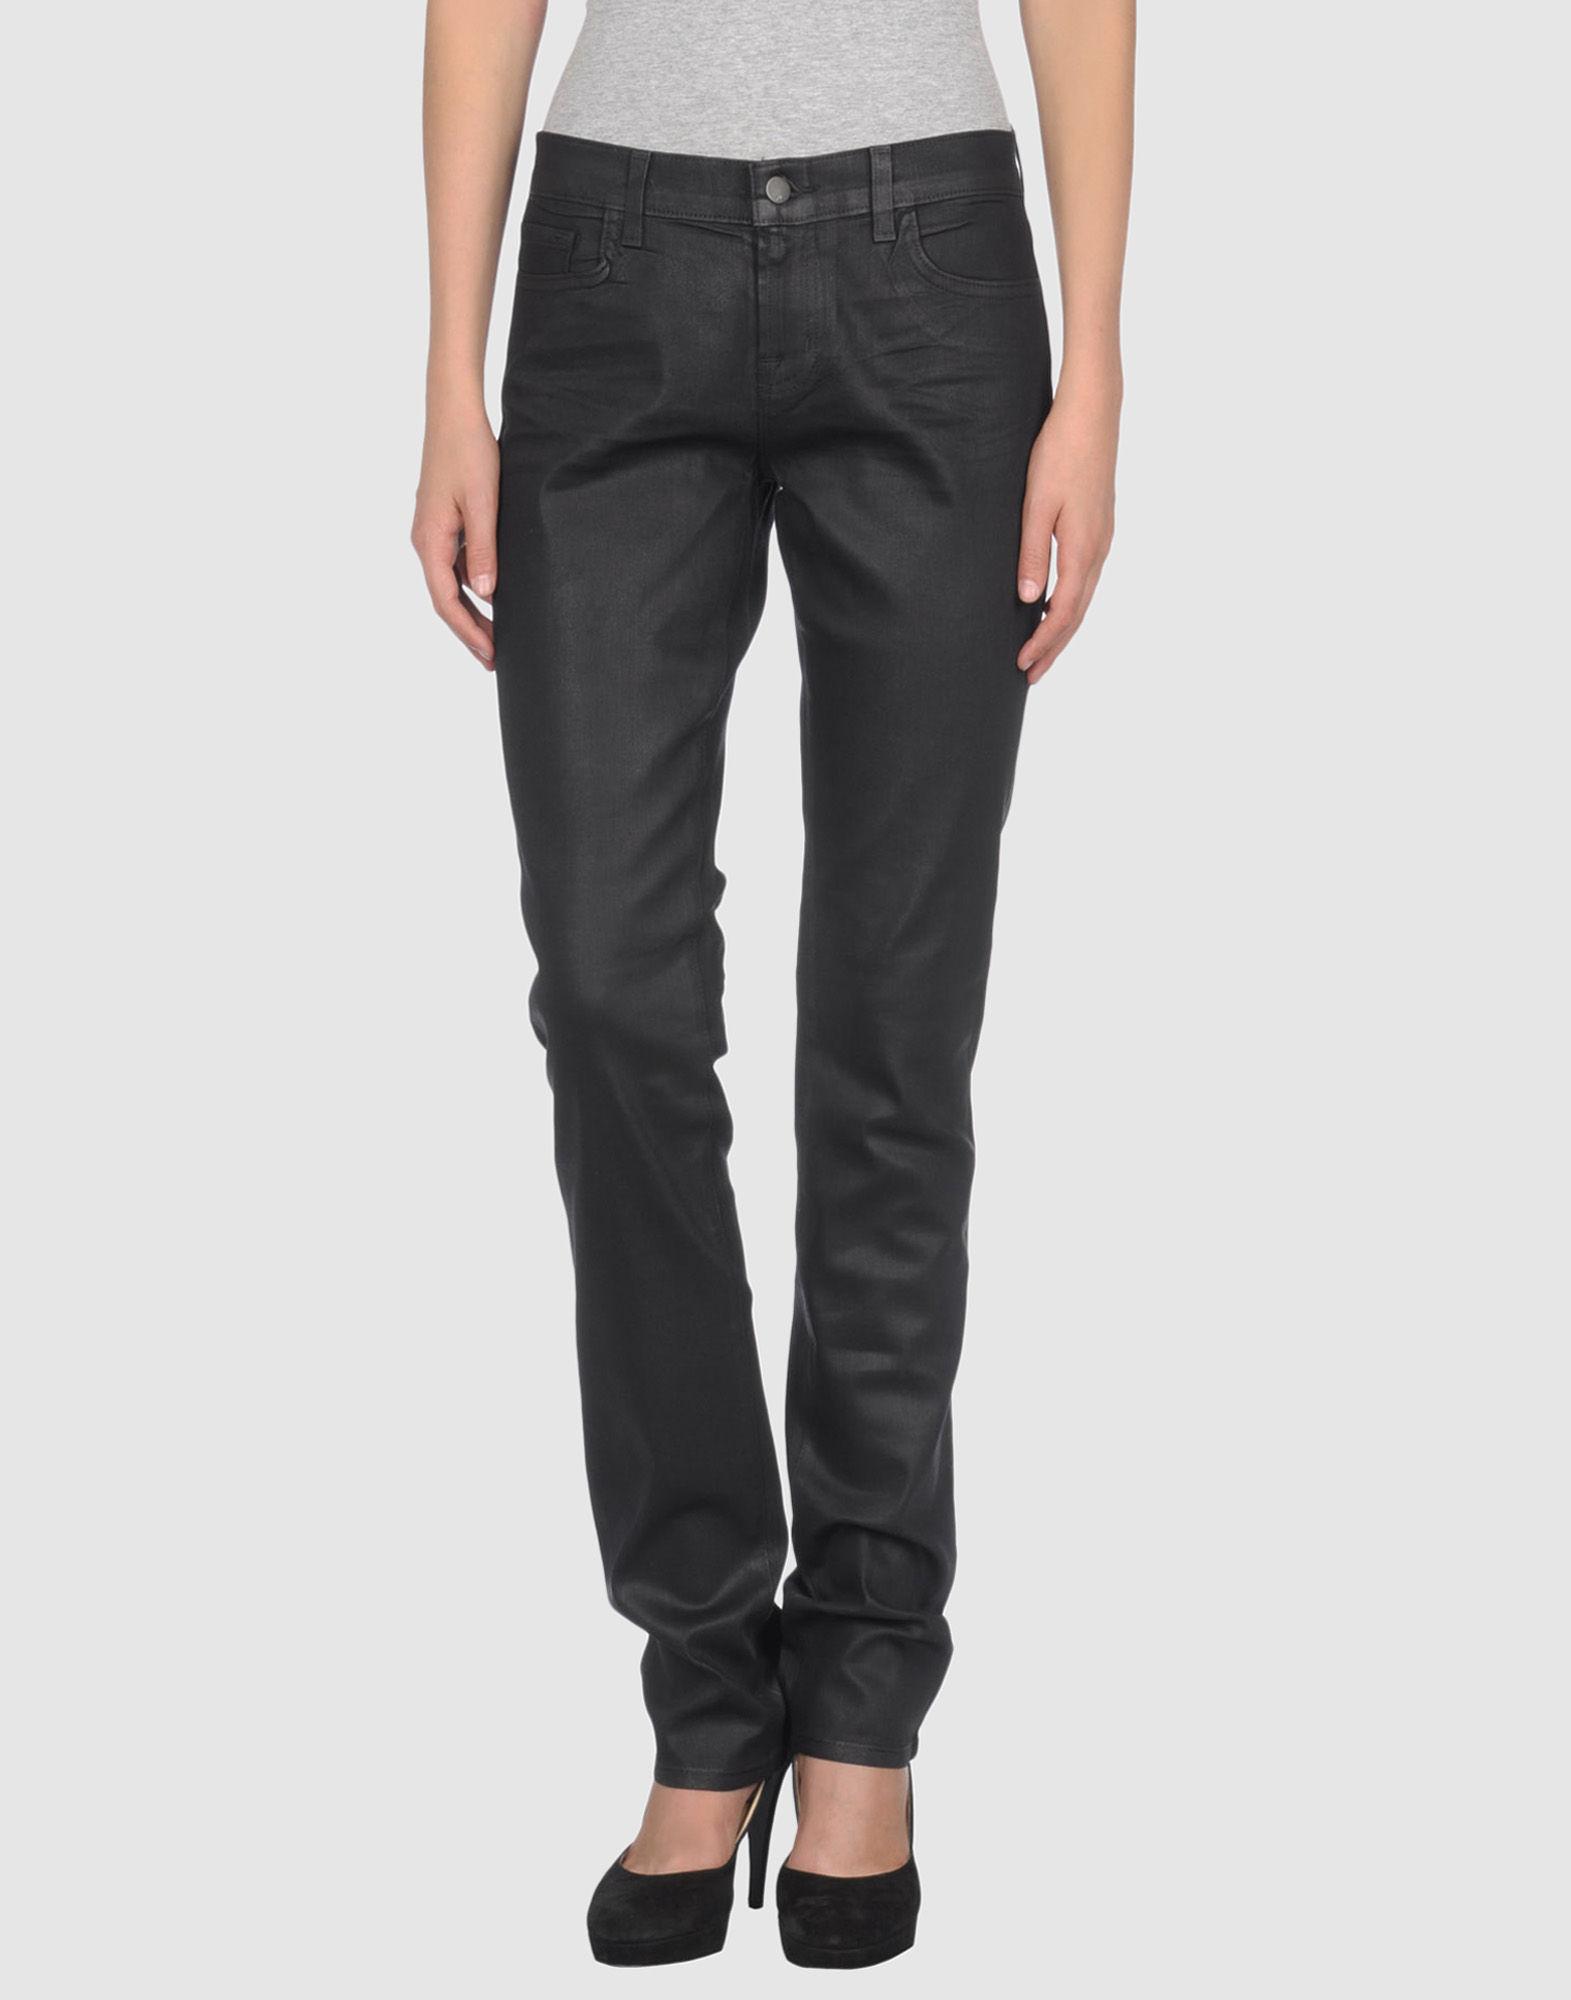 Pantaloni Jeans J Brand Donna - Acquista online su H6pzV2IUr